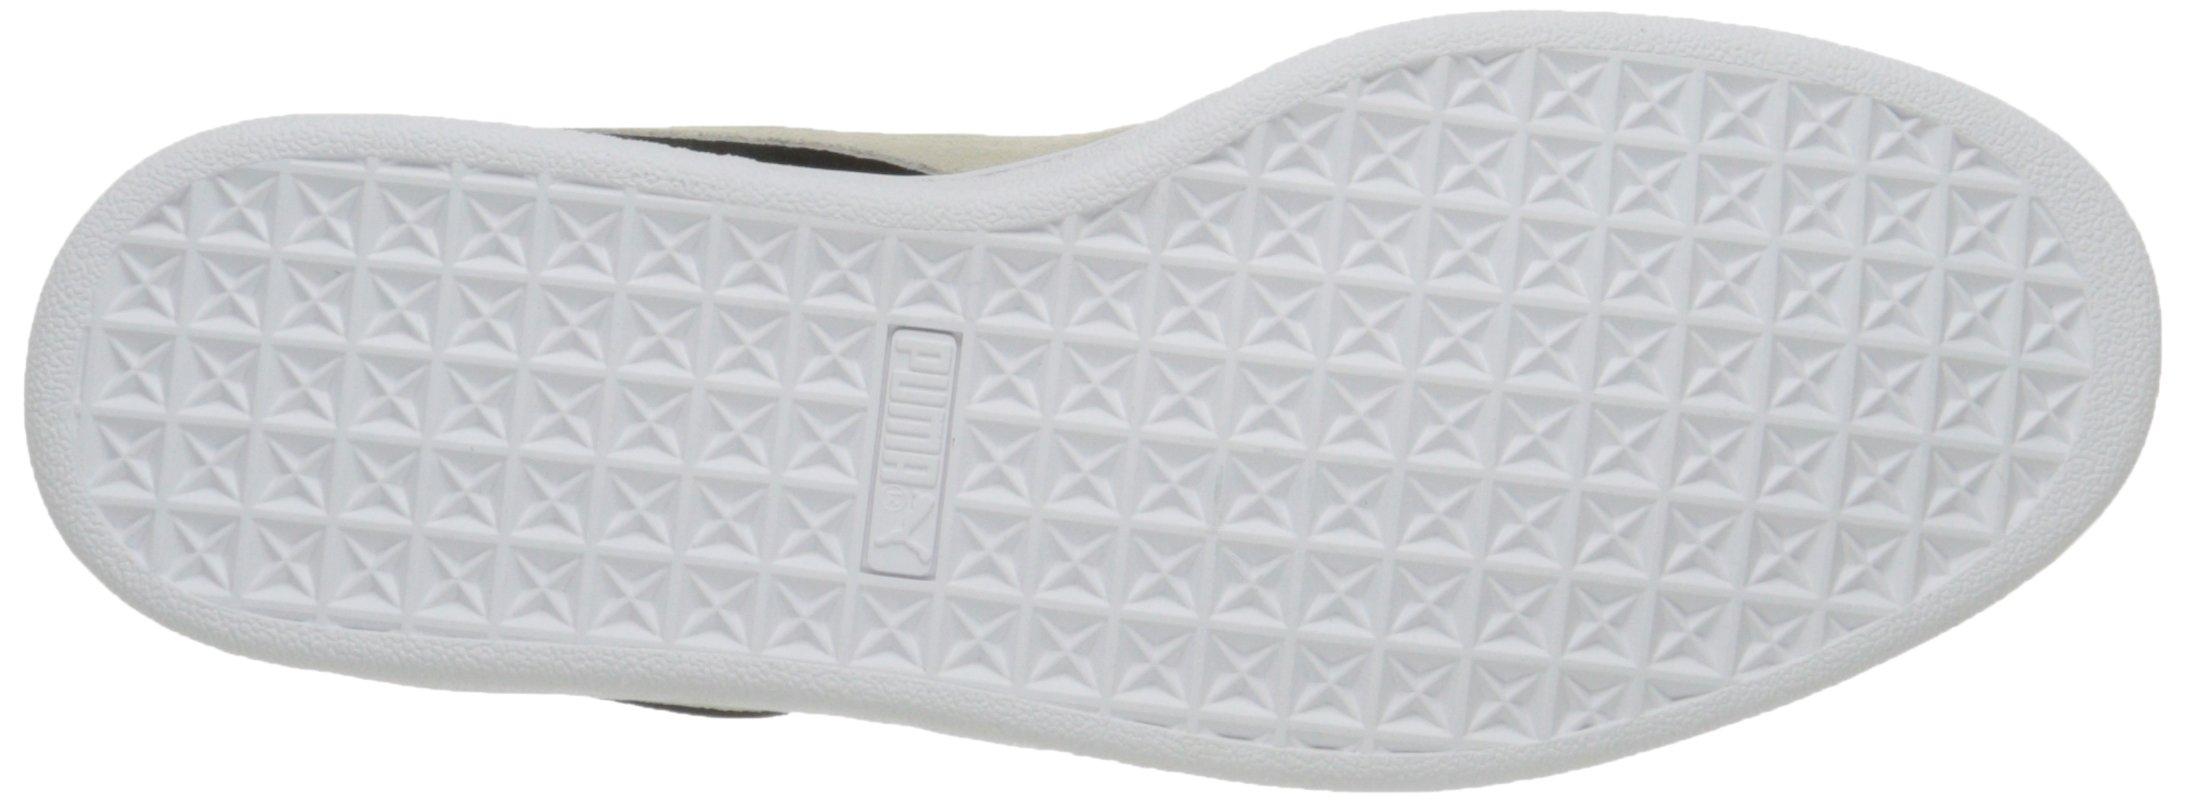 PUMA Suede Classic Sneaker,Black/White,9.5 M US Men's by PUMA (Image #10)